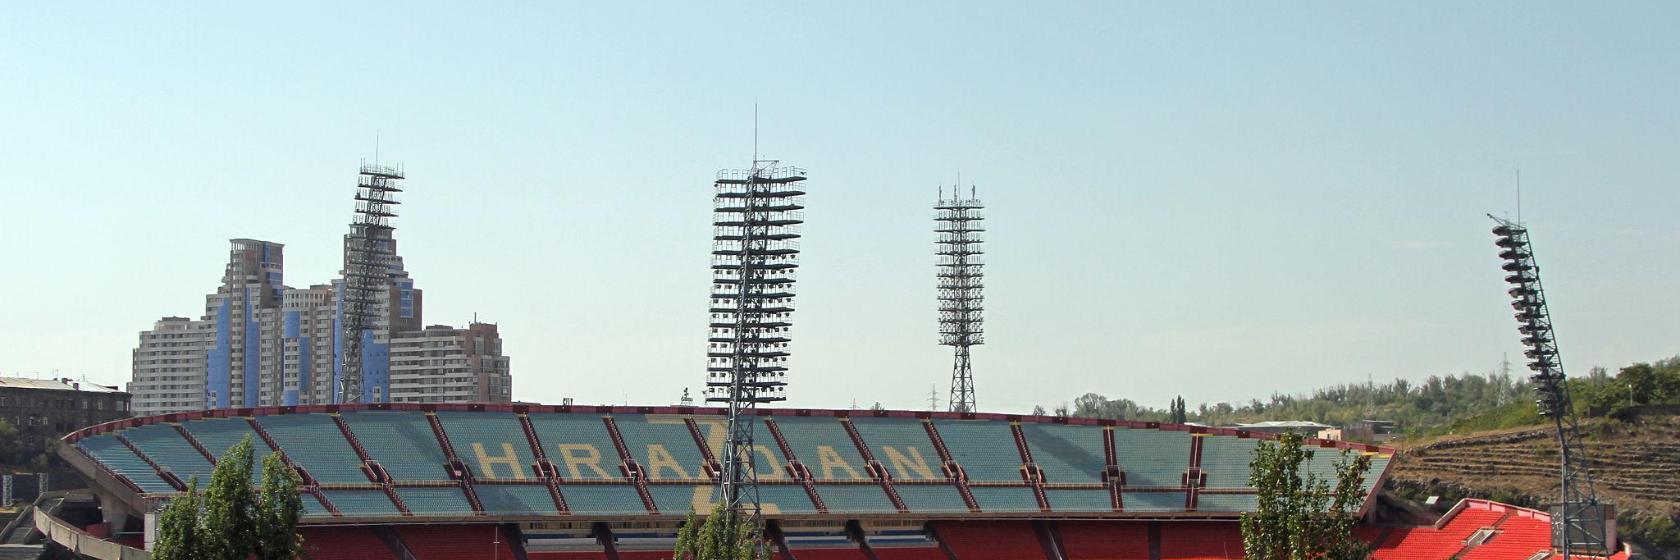 Abp 656 the 10 best hotels near hrazdan stadium in yerevan, armenia